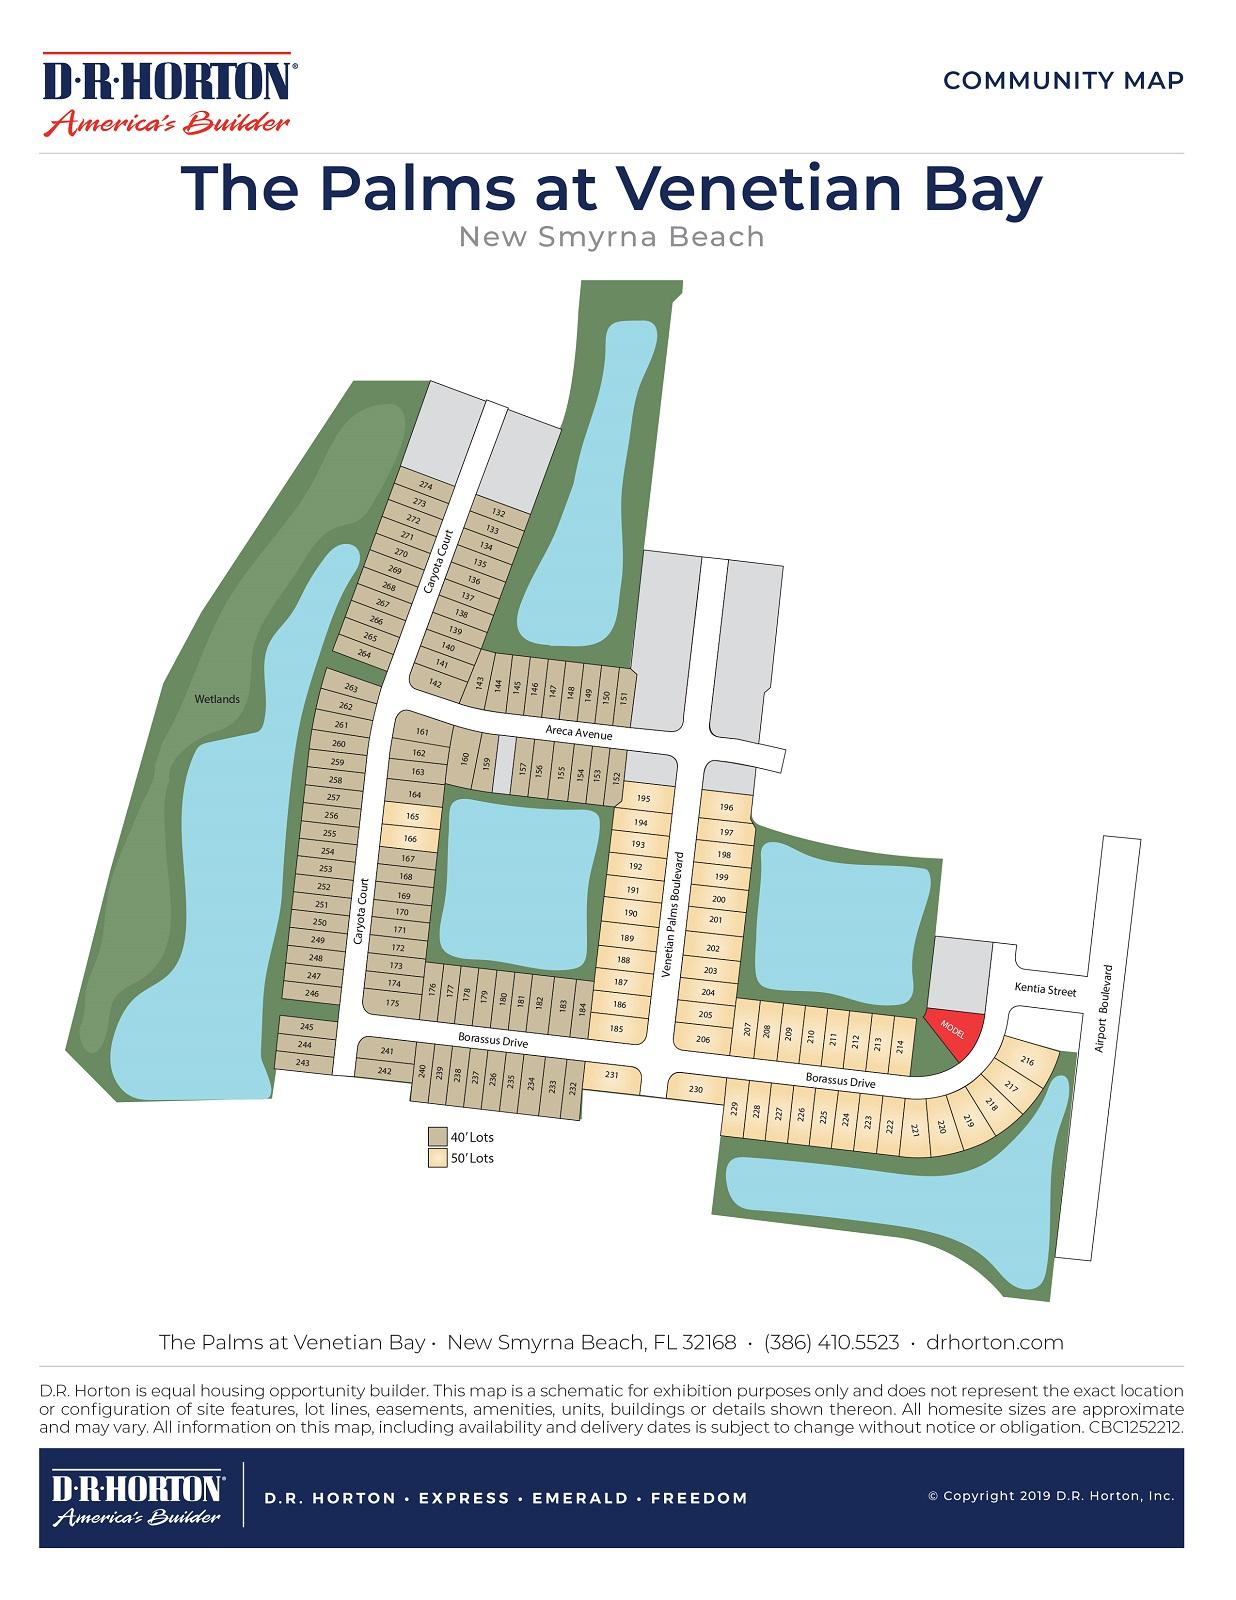 New Homes In The Palms At Venetian Bay New Smyrna Beach Fl D R Horton